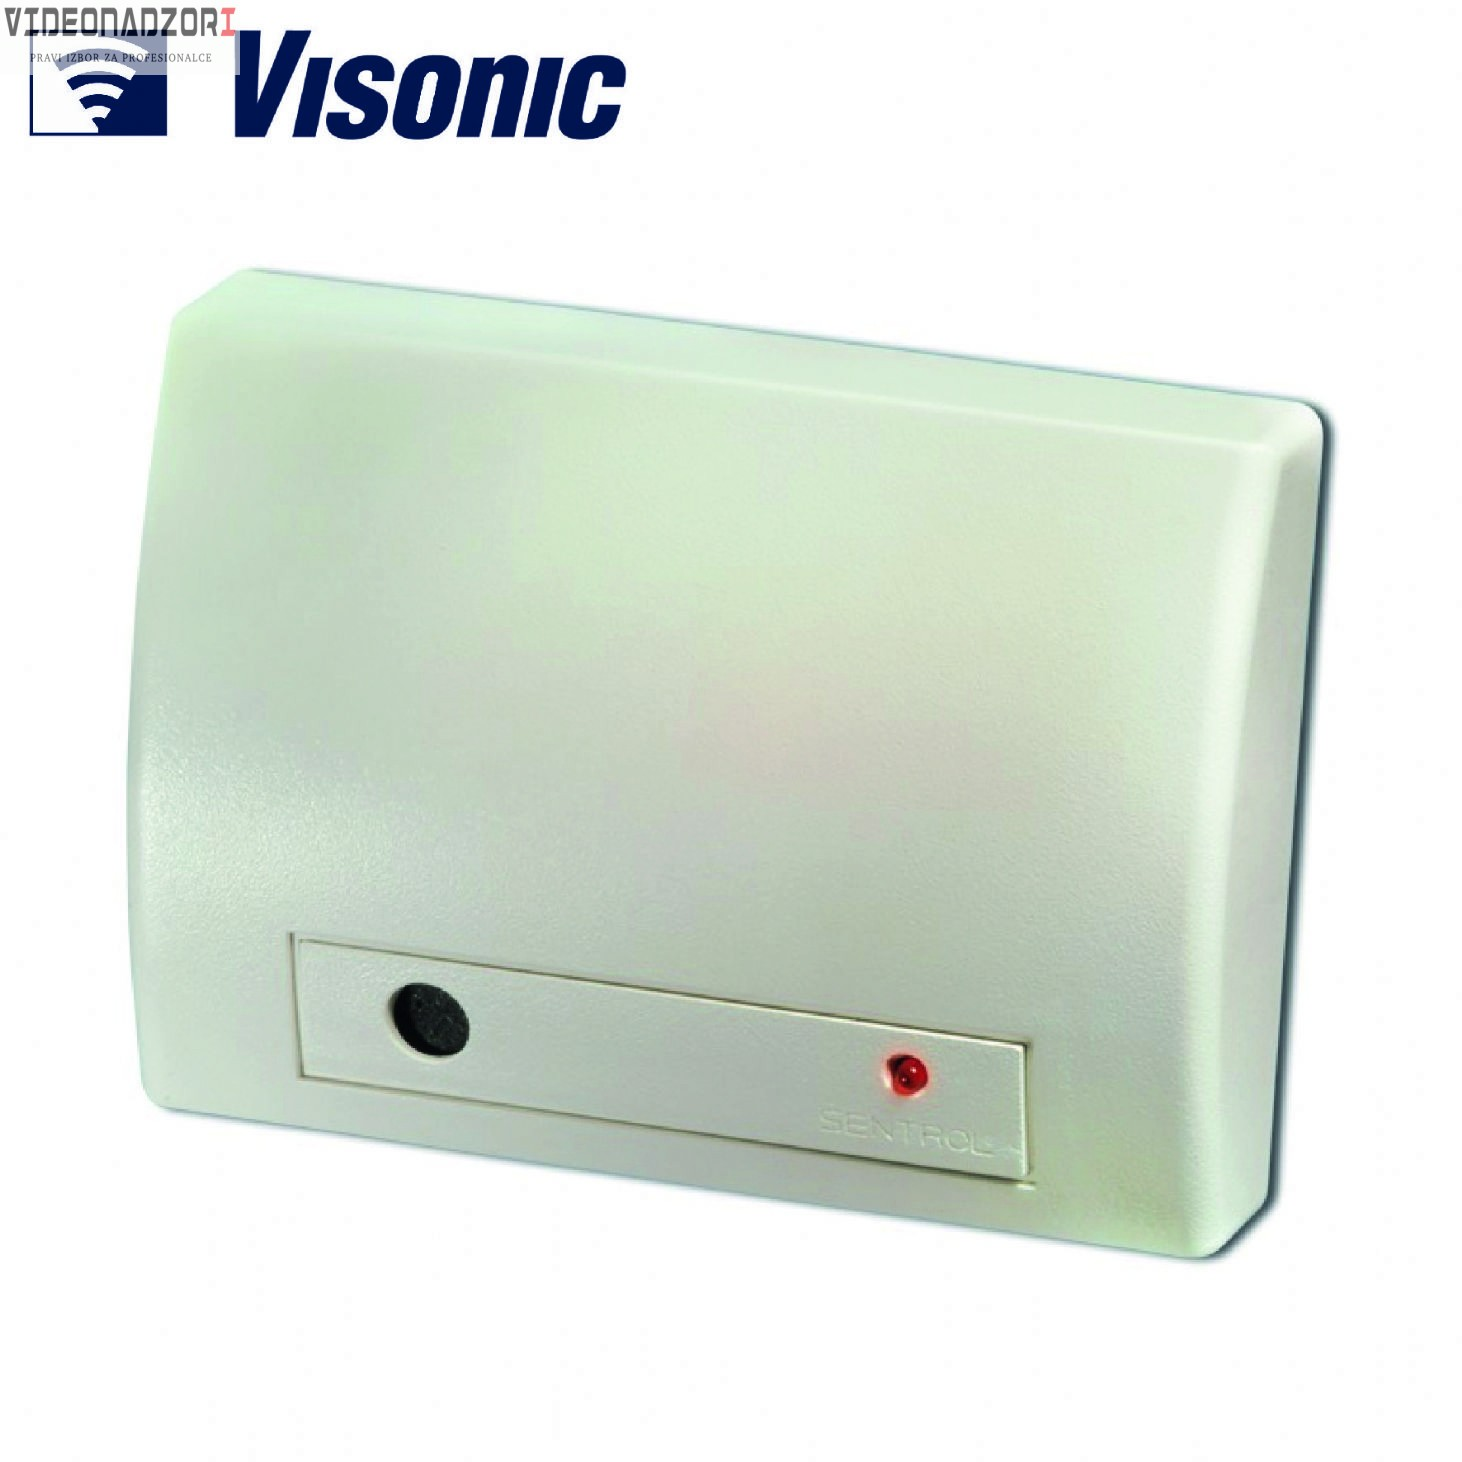 Visonic bezični detektor loma stakla MCT-501 - PG2 prodavac VideoNadzori Hrvatska  za samo 1.198,75kn